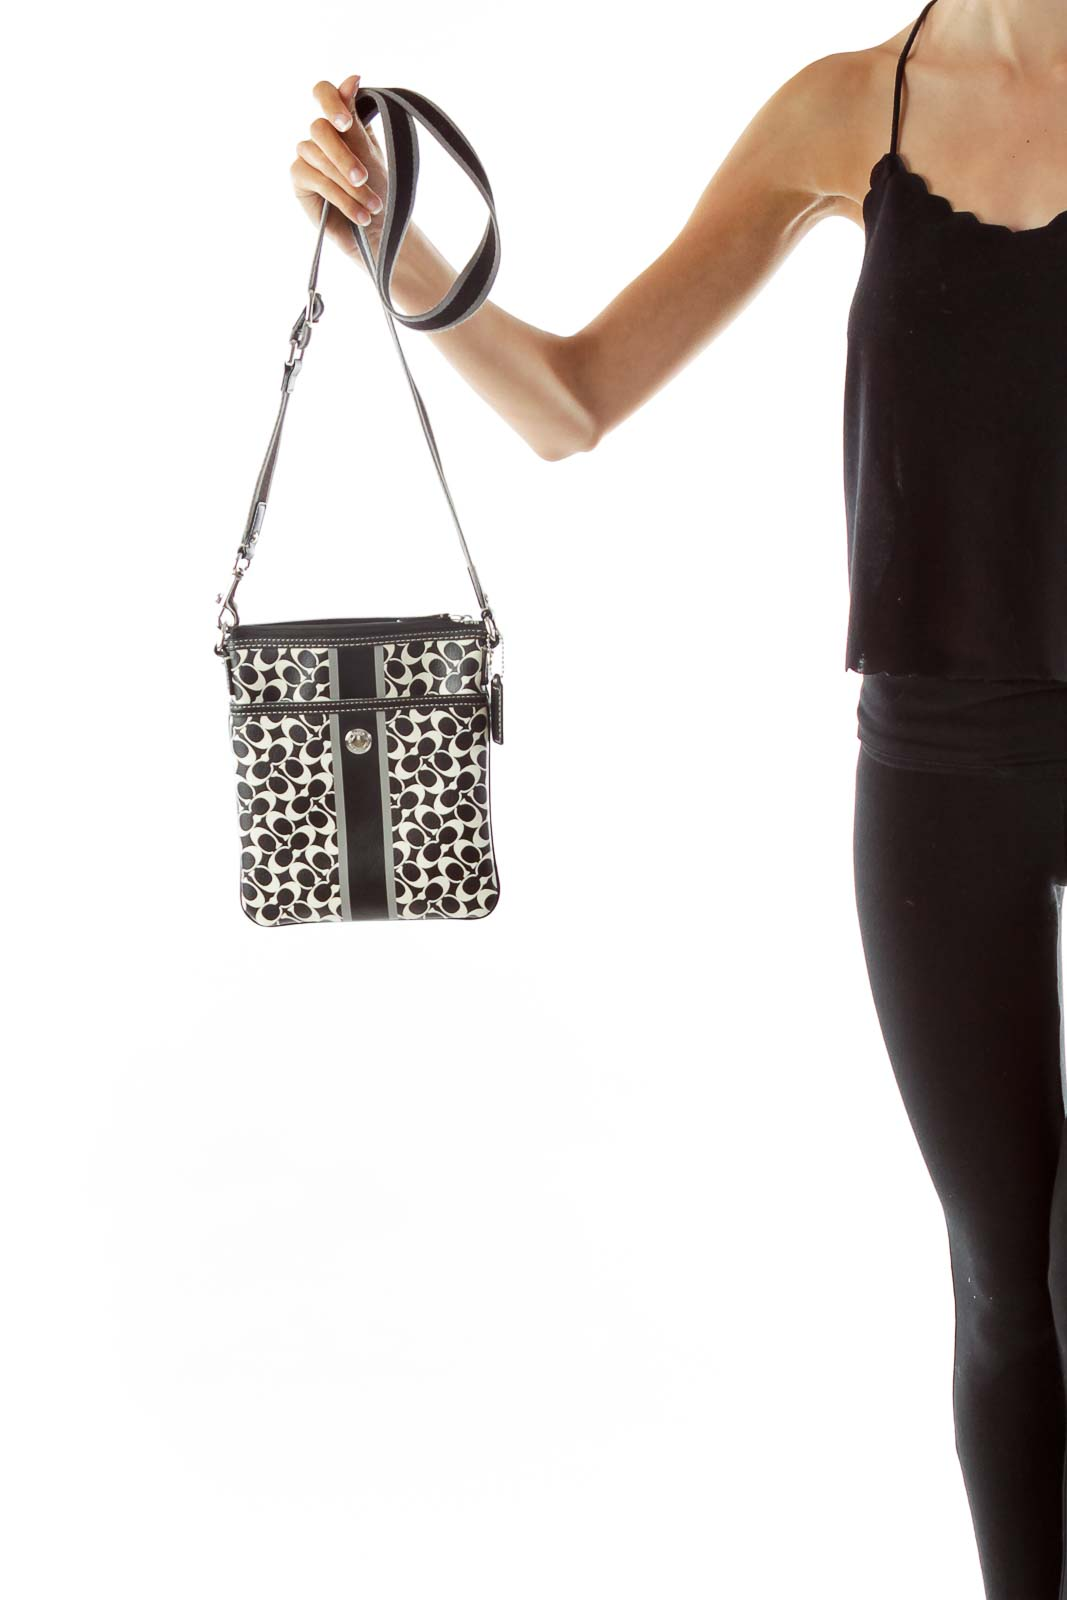 43cc0873 Shop Black White Coach Print Crossbody Bag clothing and handbags at ...